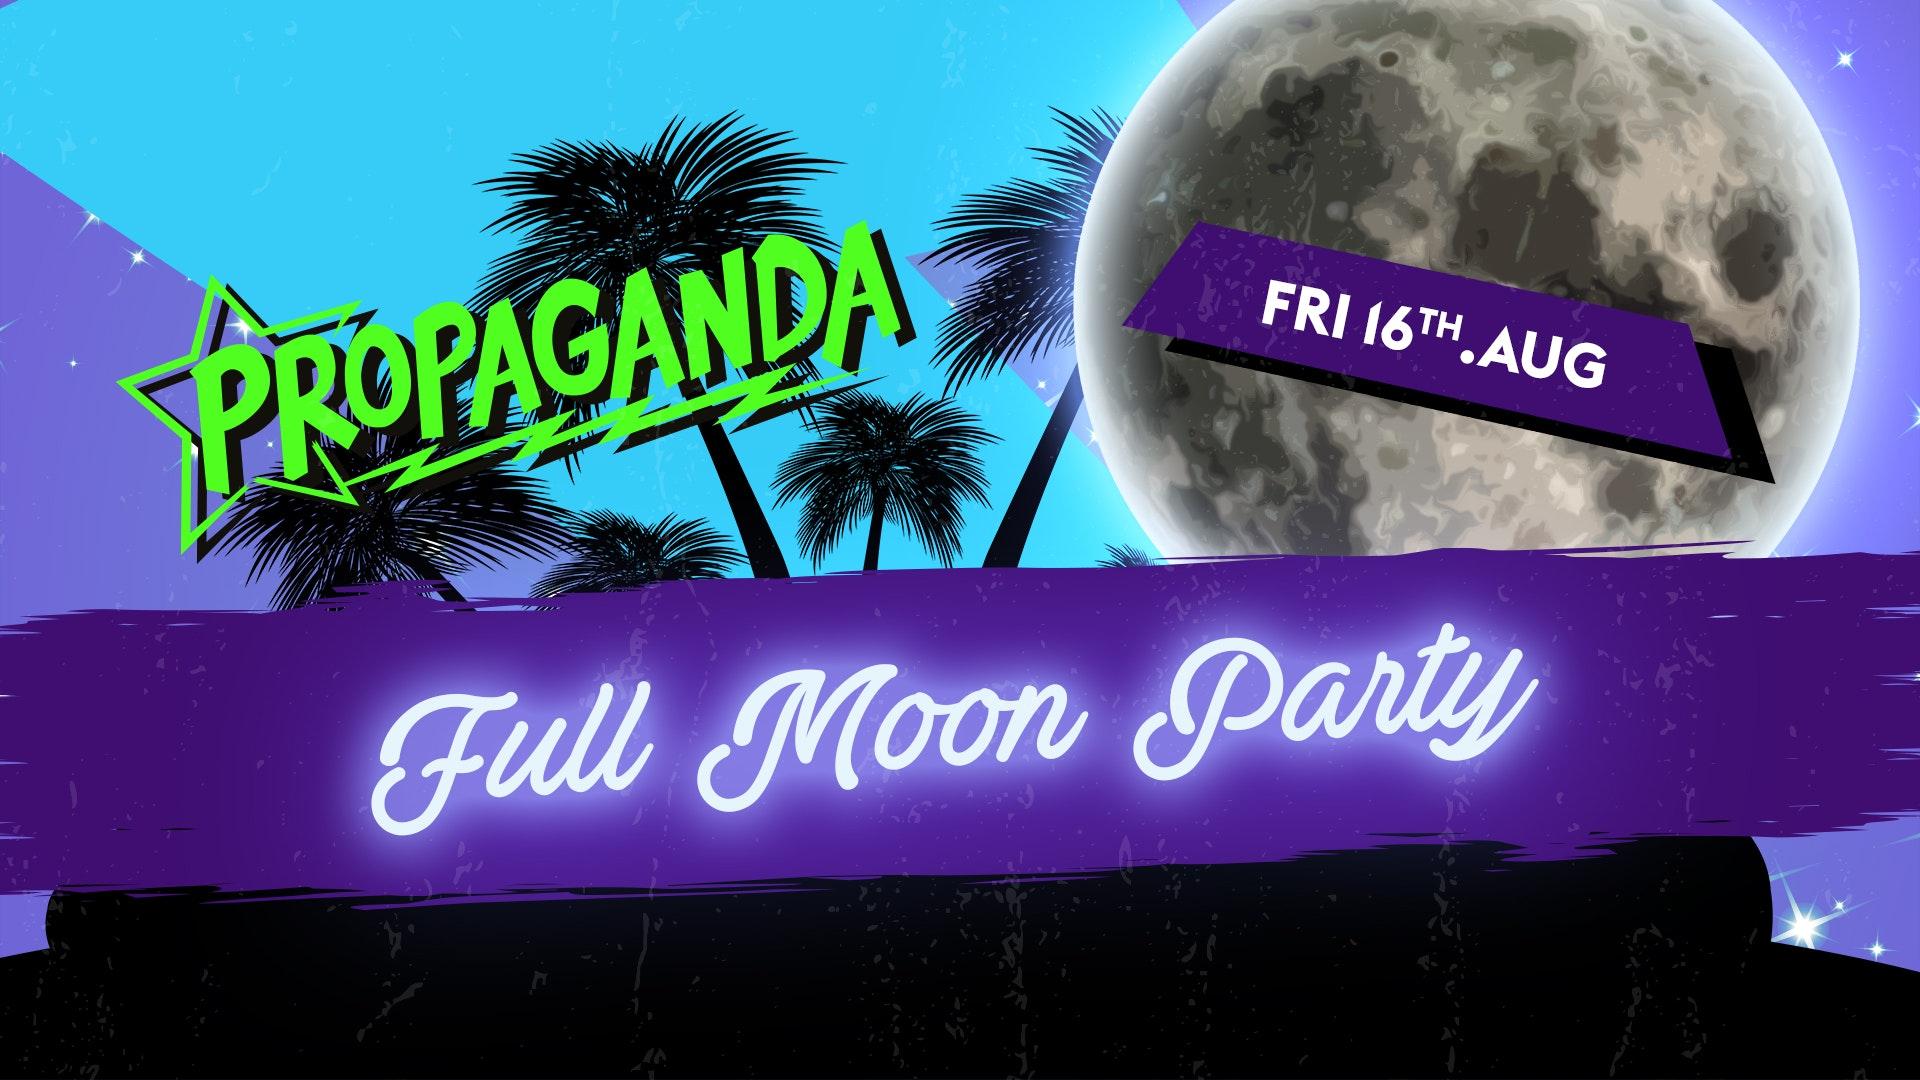 Propaganda Cambridge – Full Moon Party